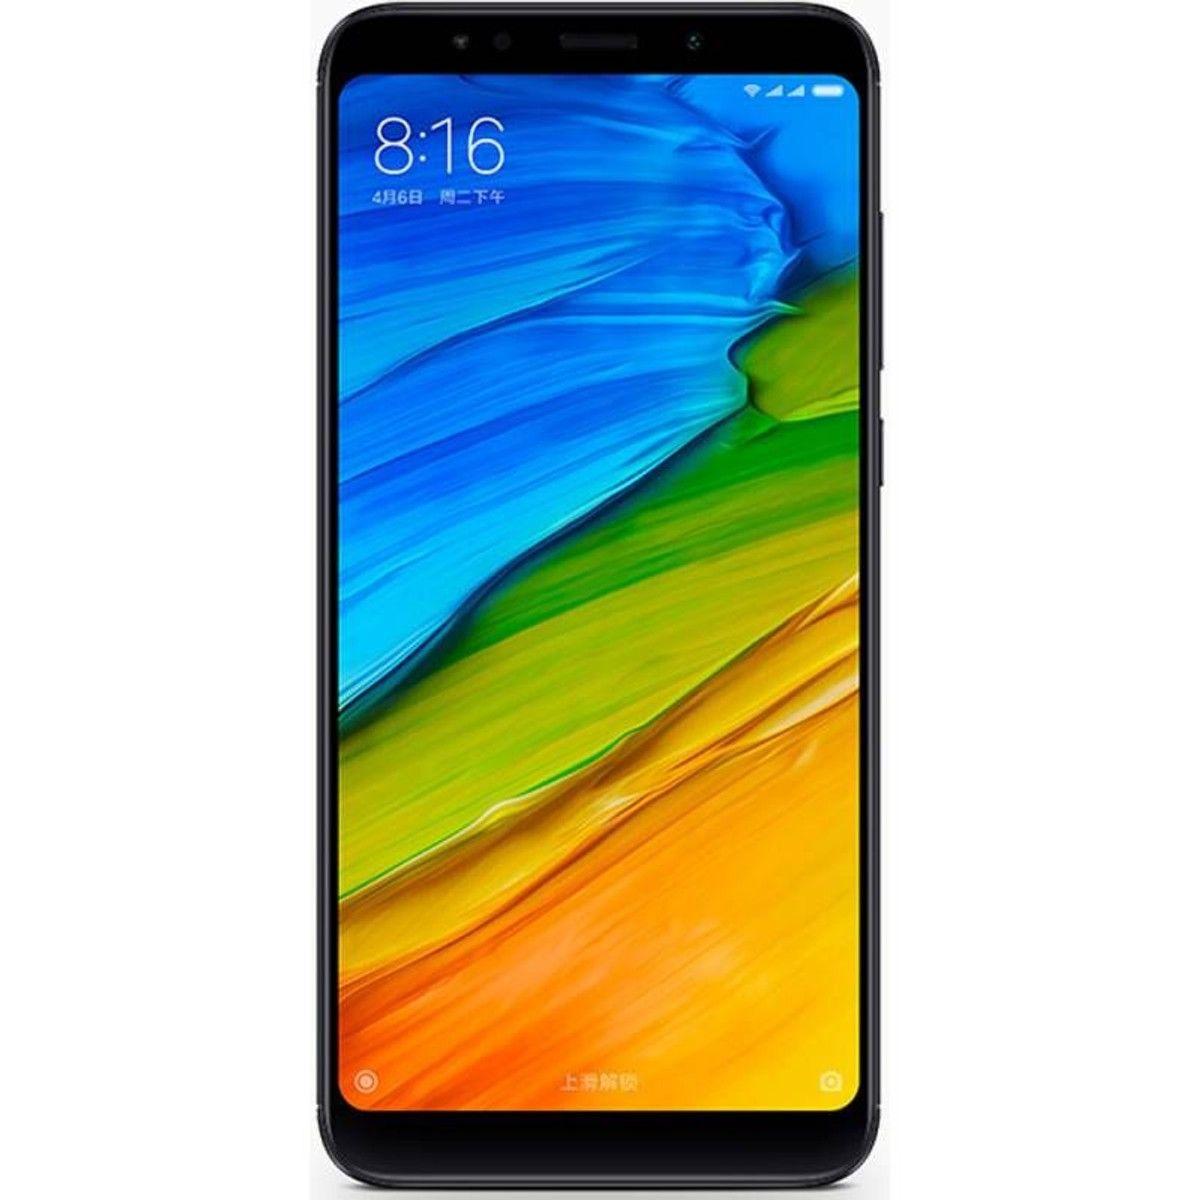 Smartphone Xiaomi Redmi 5 Plus Double Sim 64go 4go Ram Taille Tu En 2019 Android Phone Telephones Portables Et Portable